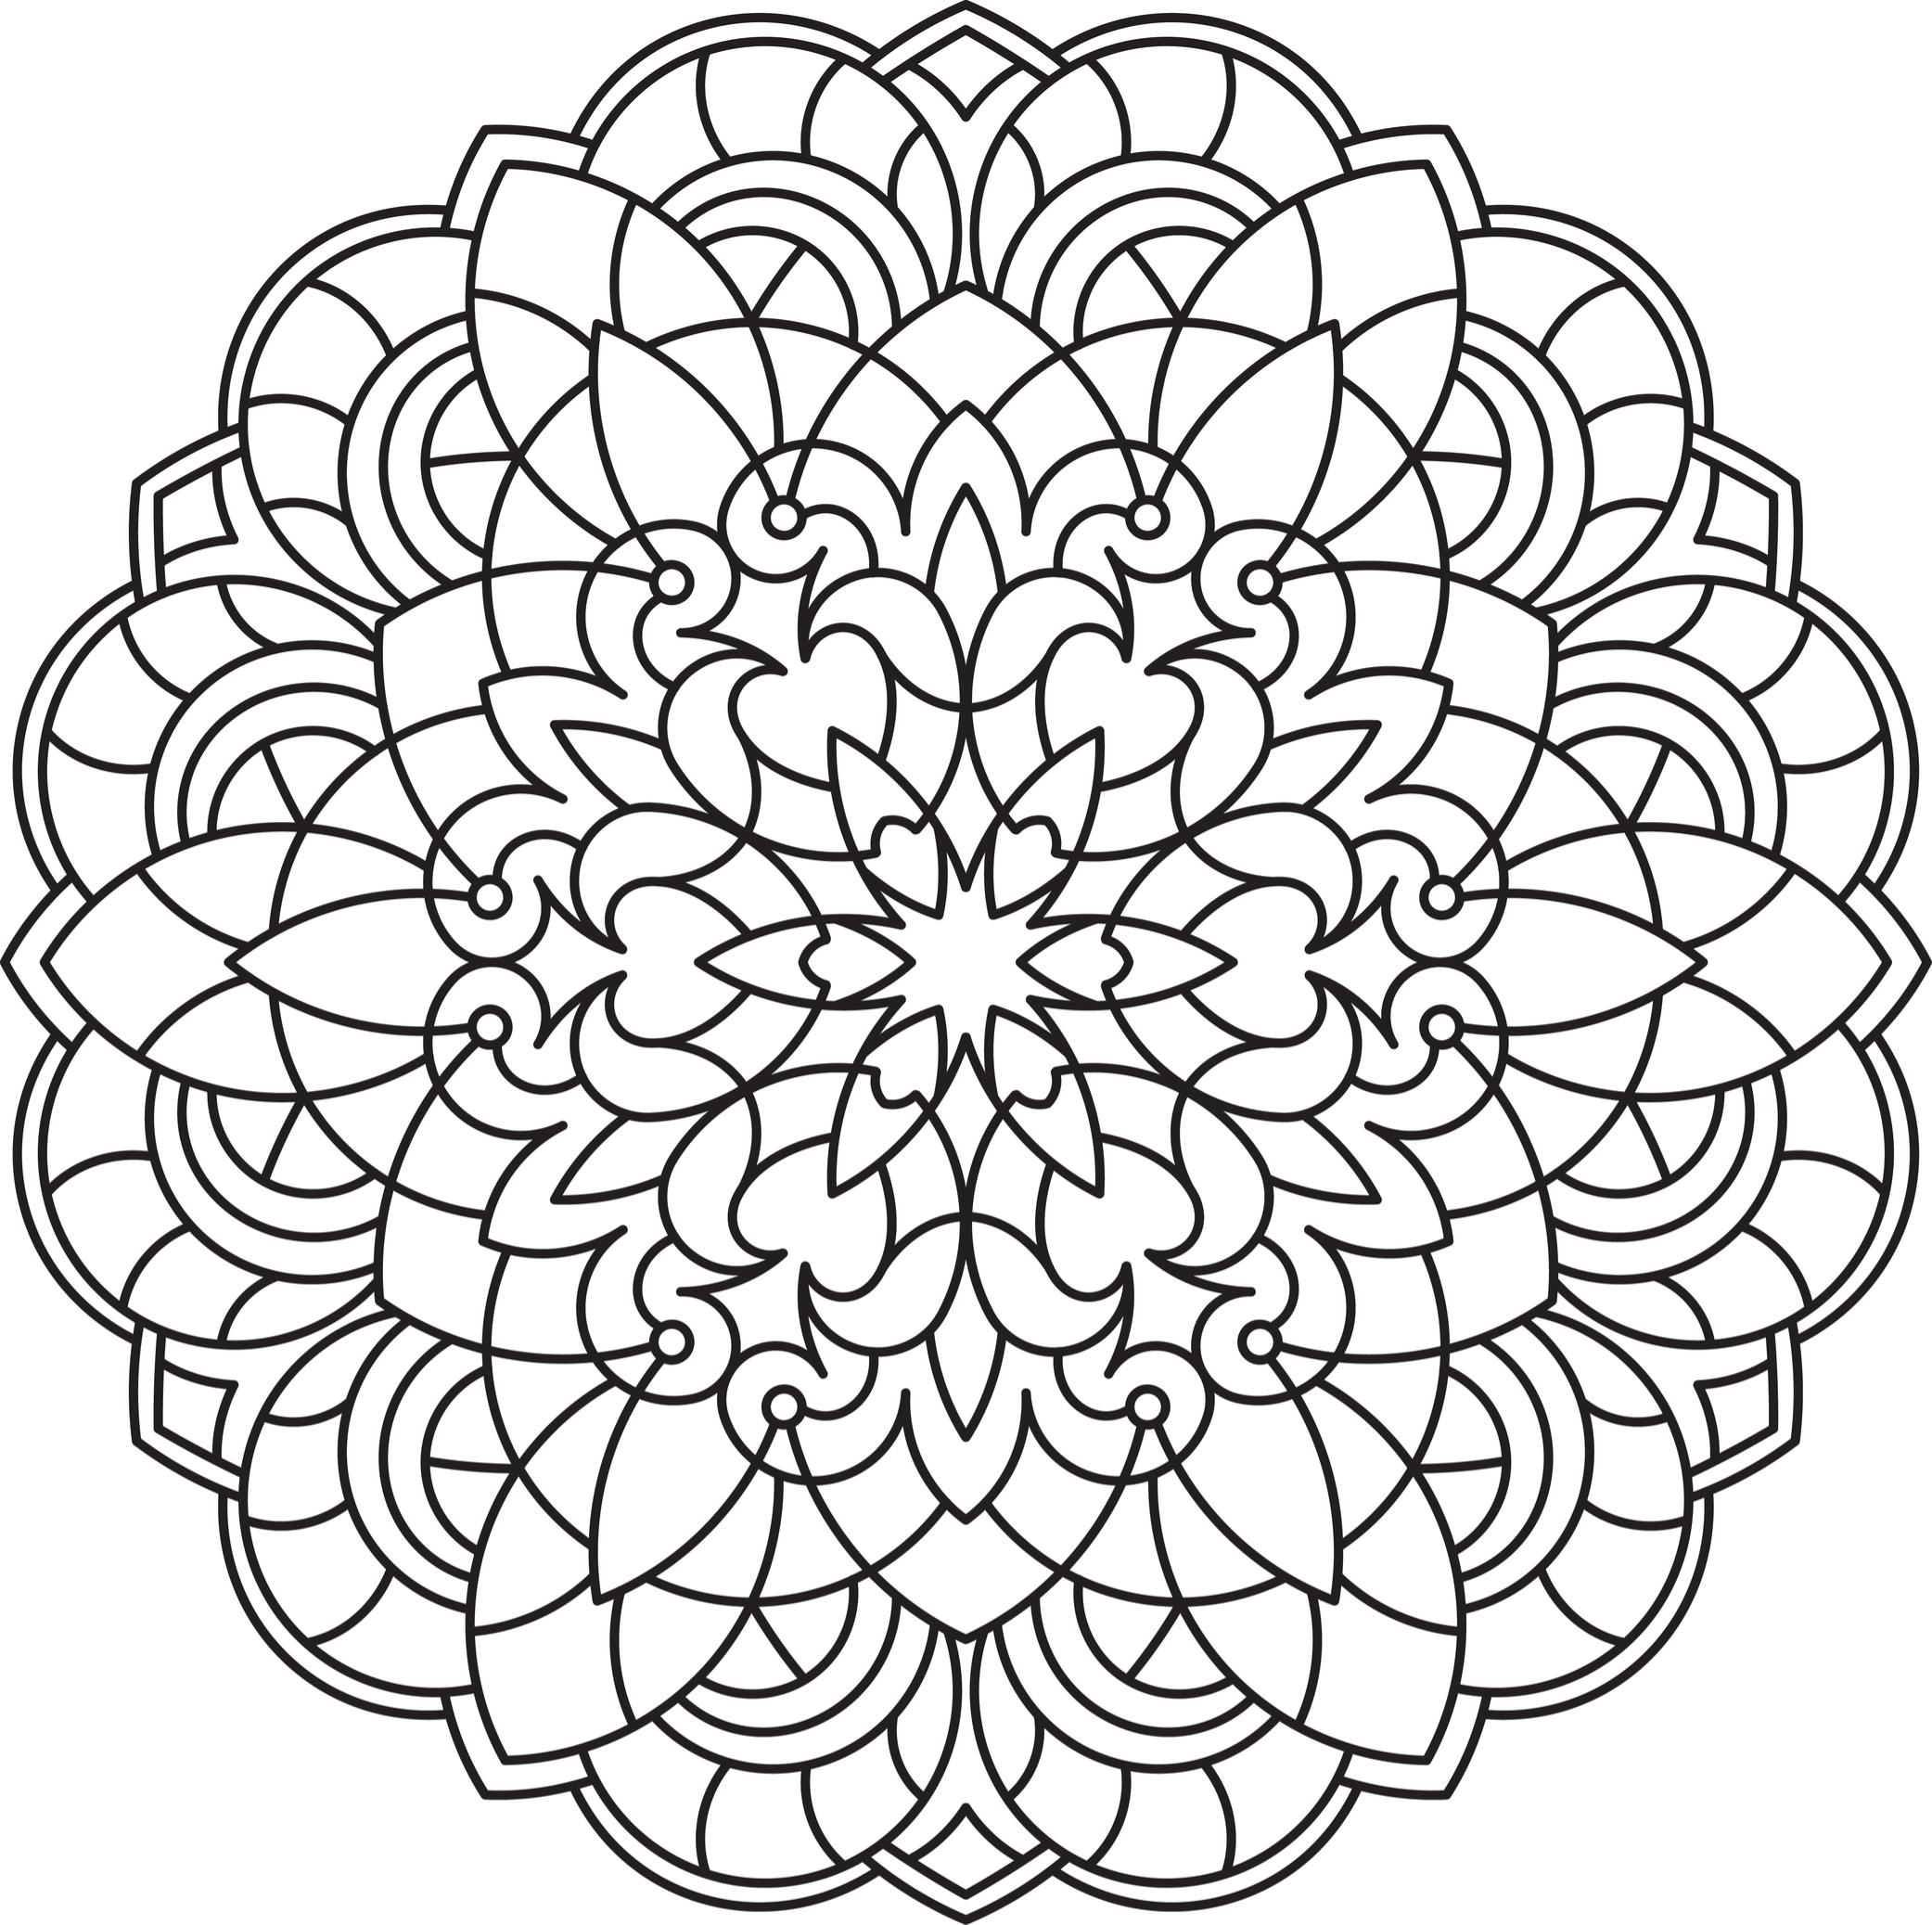 ▷ Mandalas tibetanos, de amor, para niños... Descúbrelos ...